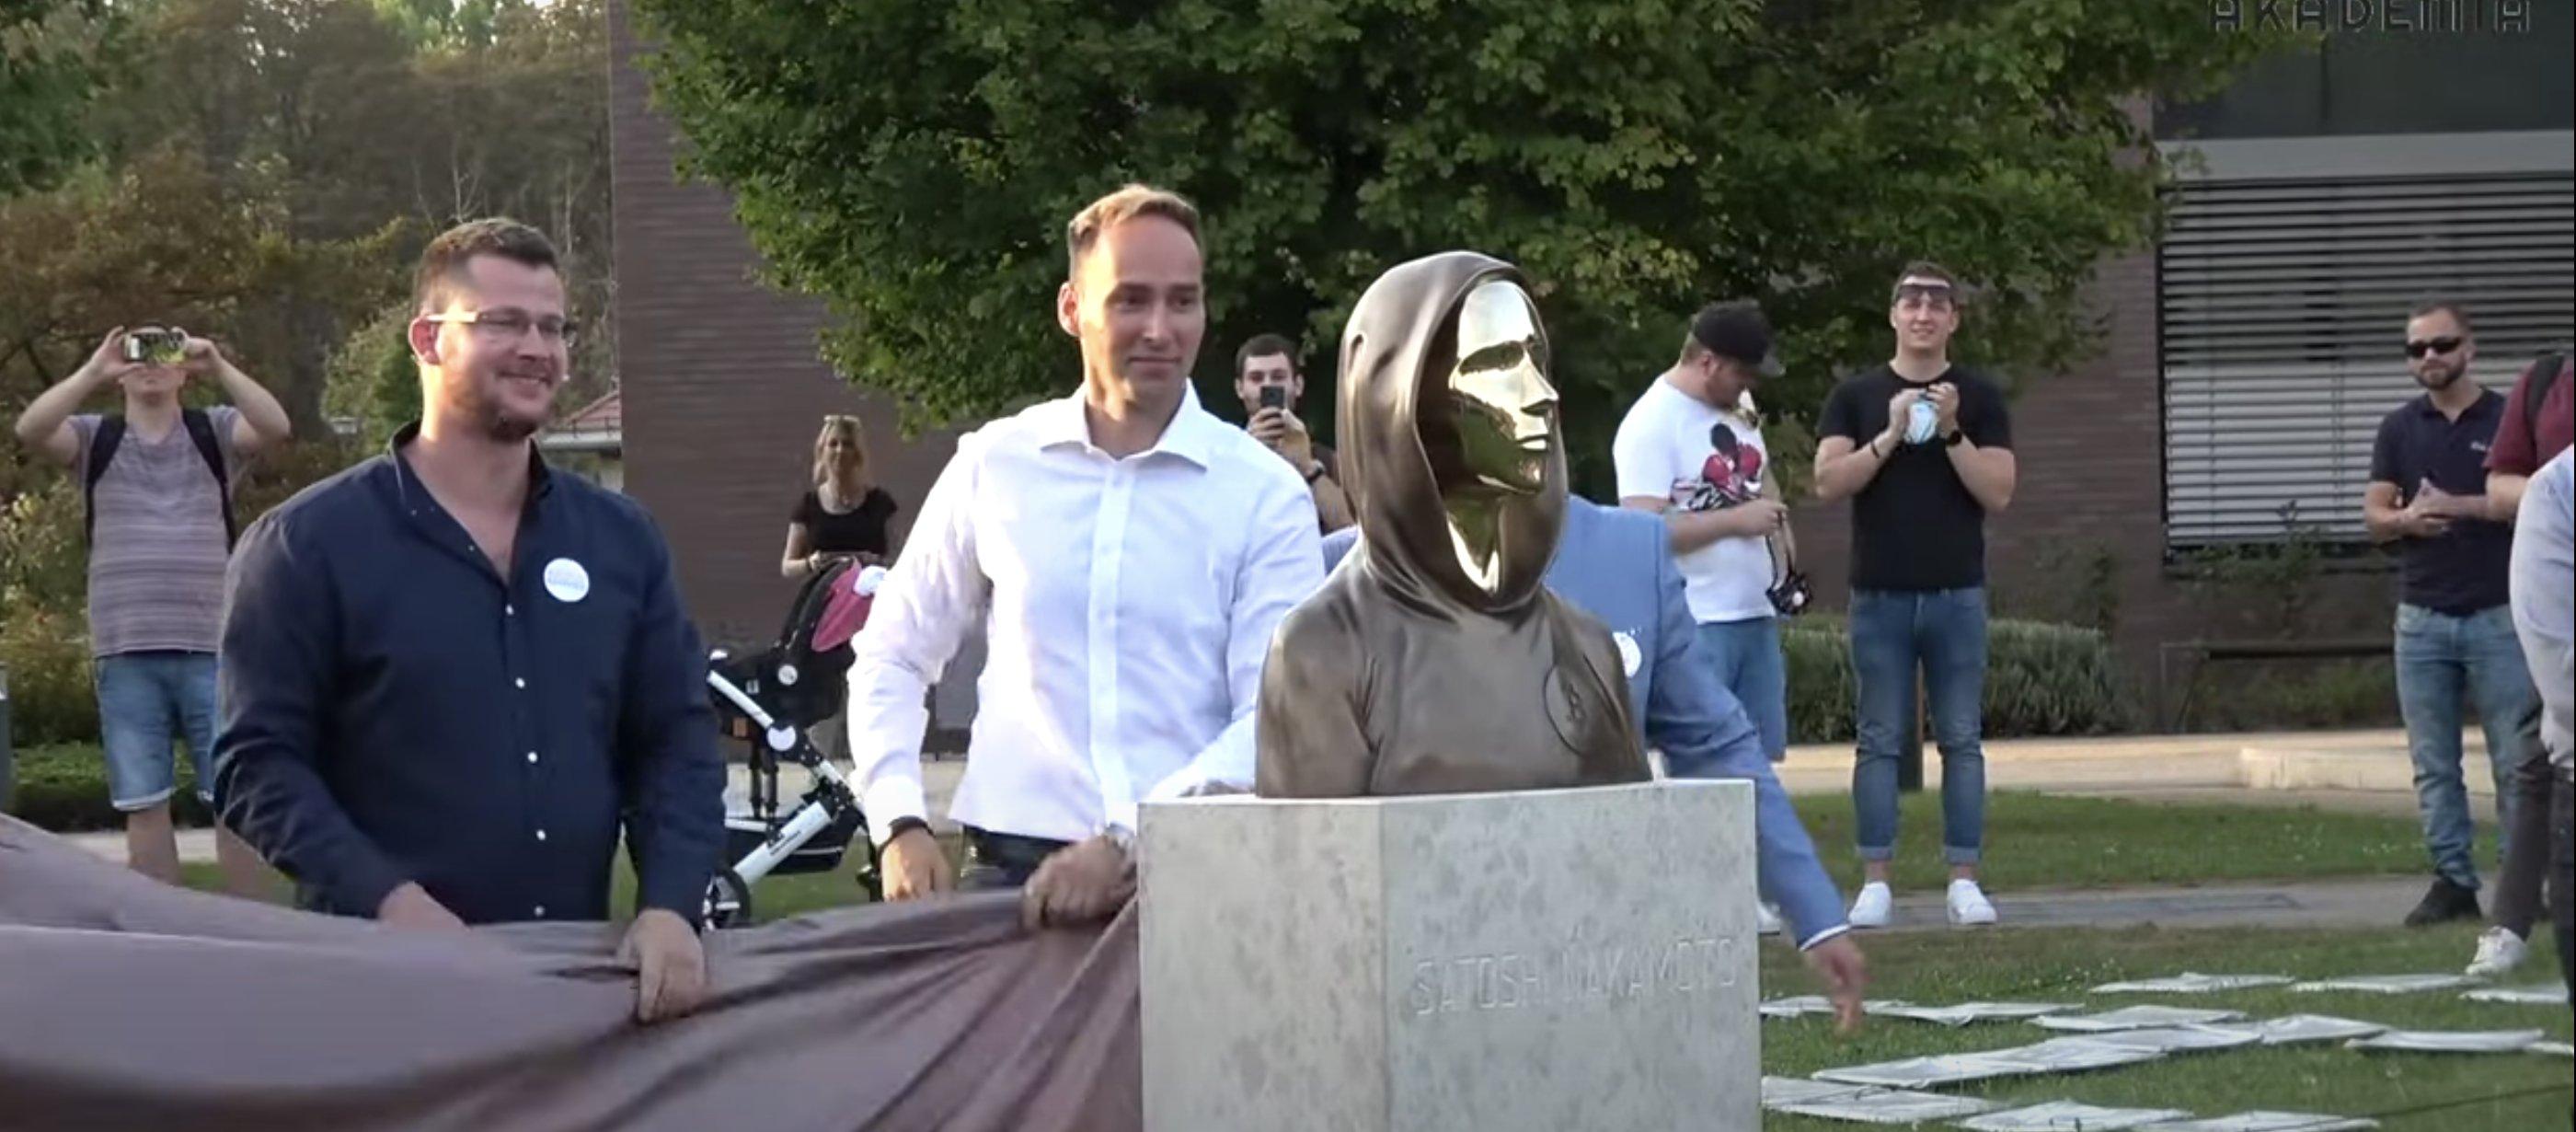 Satoshi Nakamoto Statue Unveiled